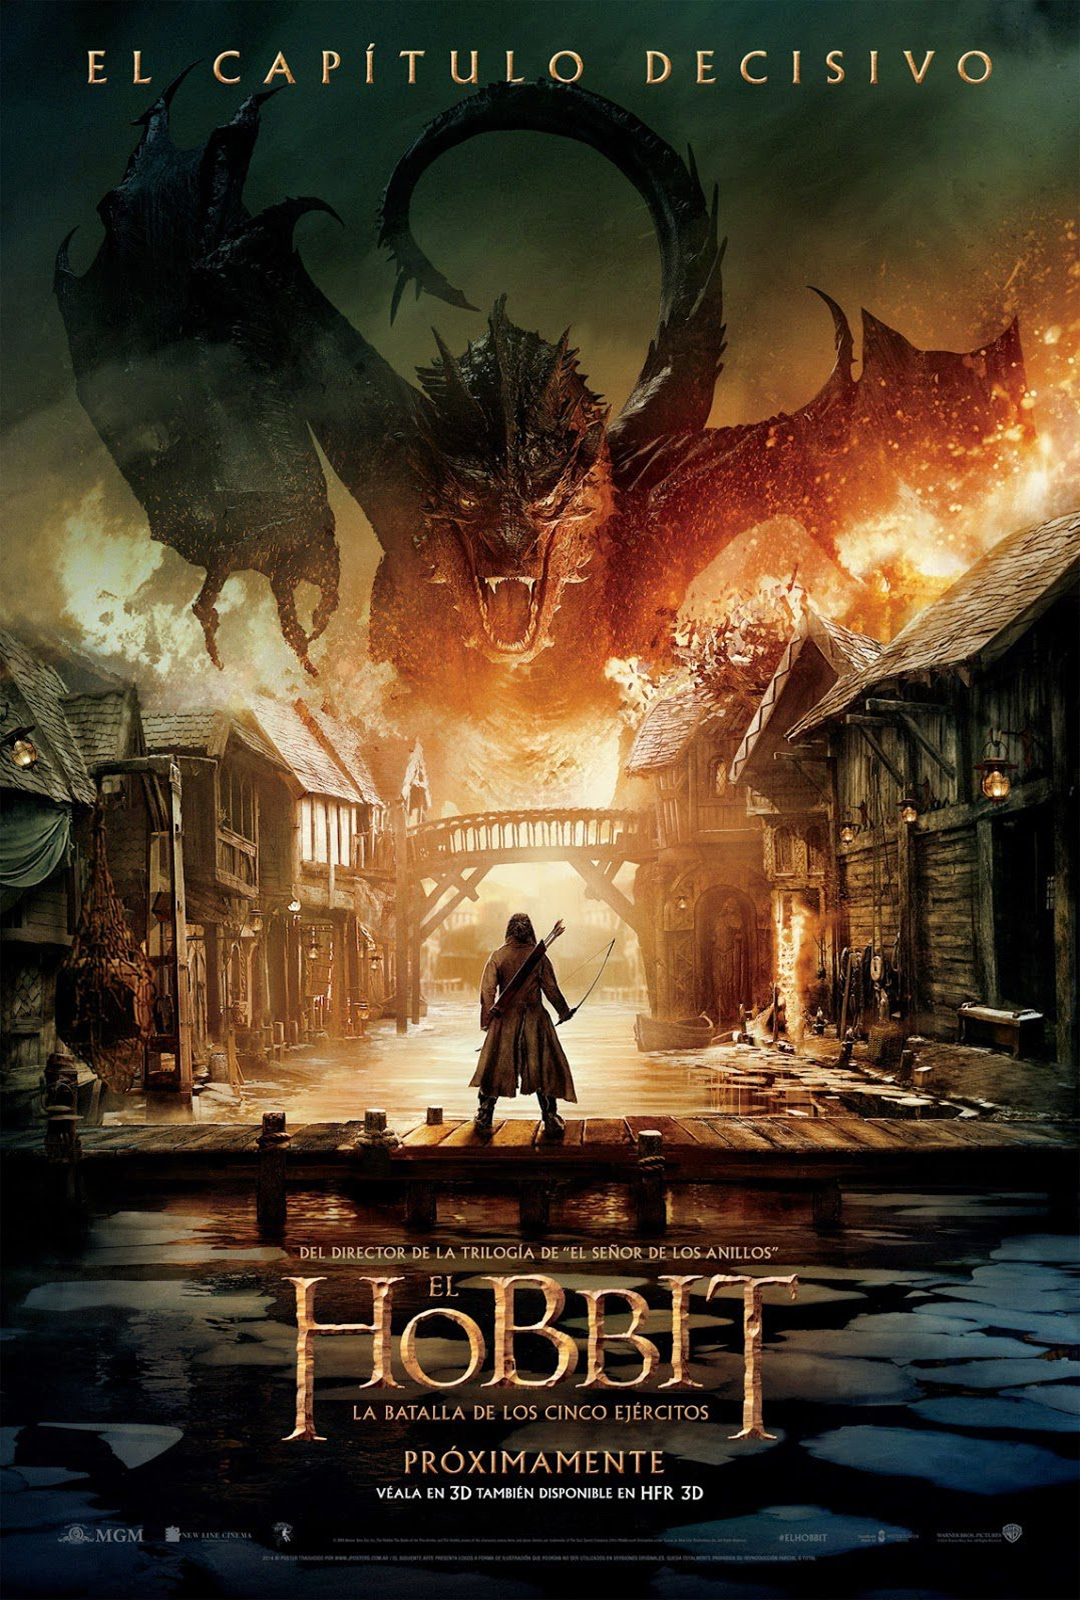 http://www.elseptimoarte.net/carteles/el_hobbit_la_batalla_de_los_cinco_ejercitos_30855.jpg